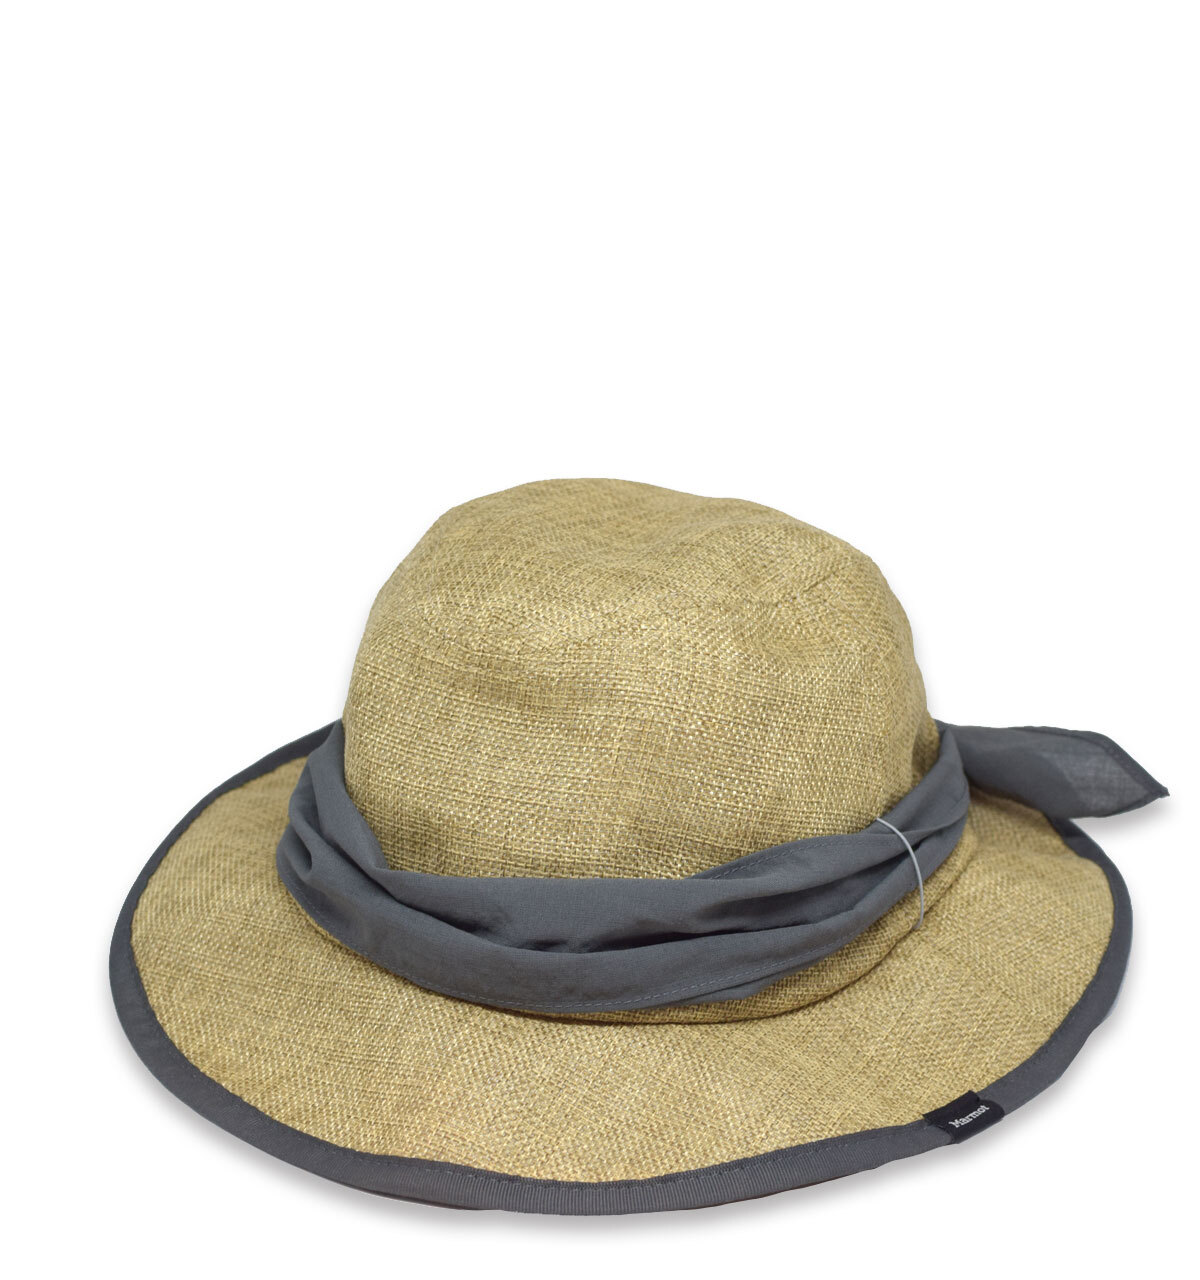 Marmot W's 2way Jute Hat ウィメンズ2ウェイジュートハット(四角友里コラボ)